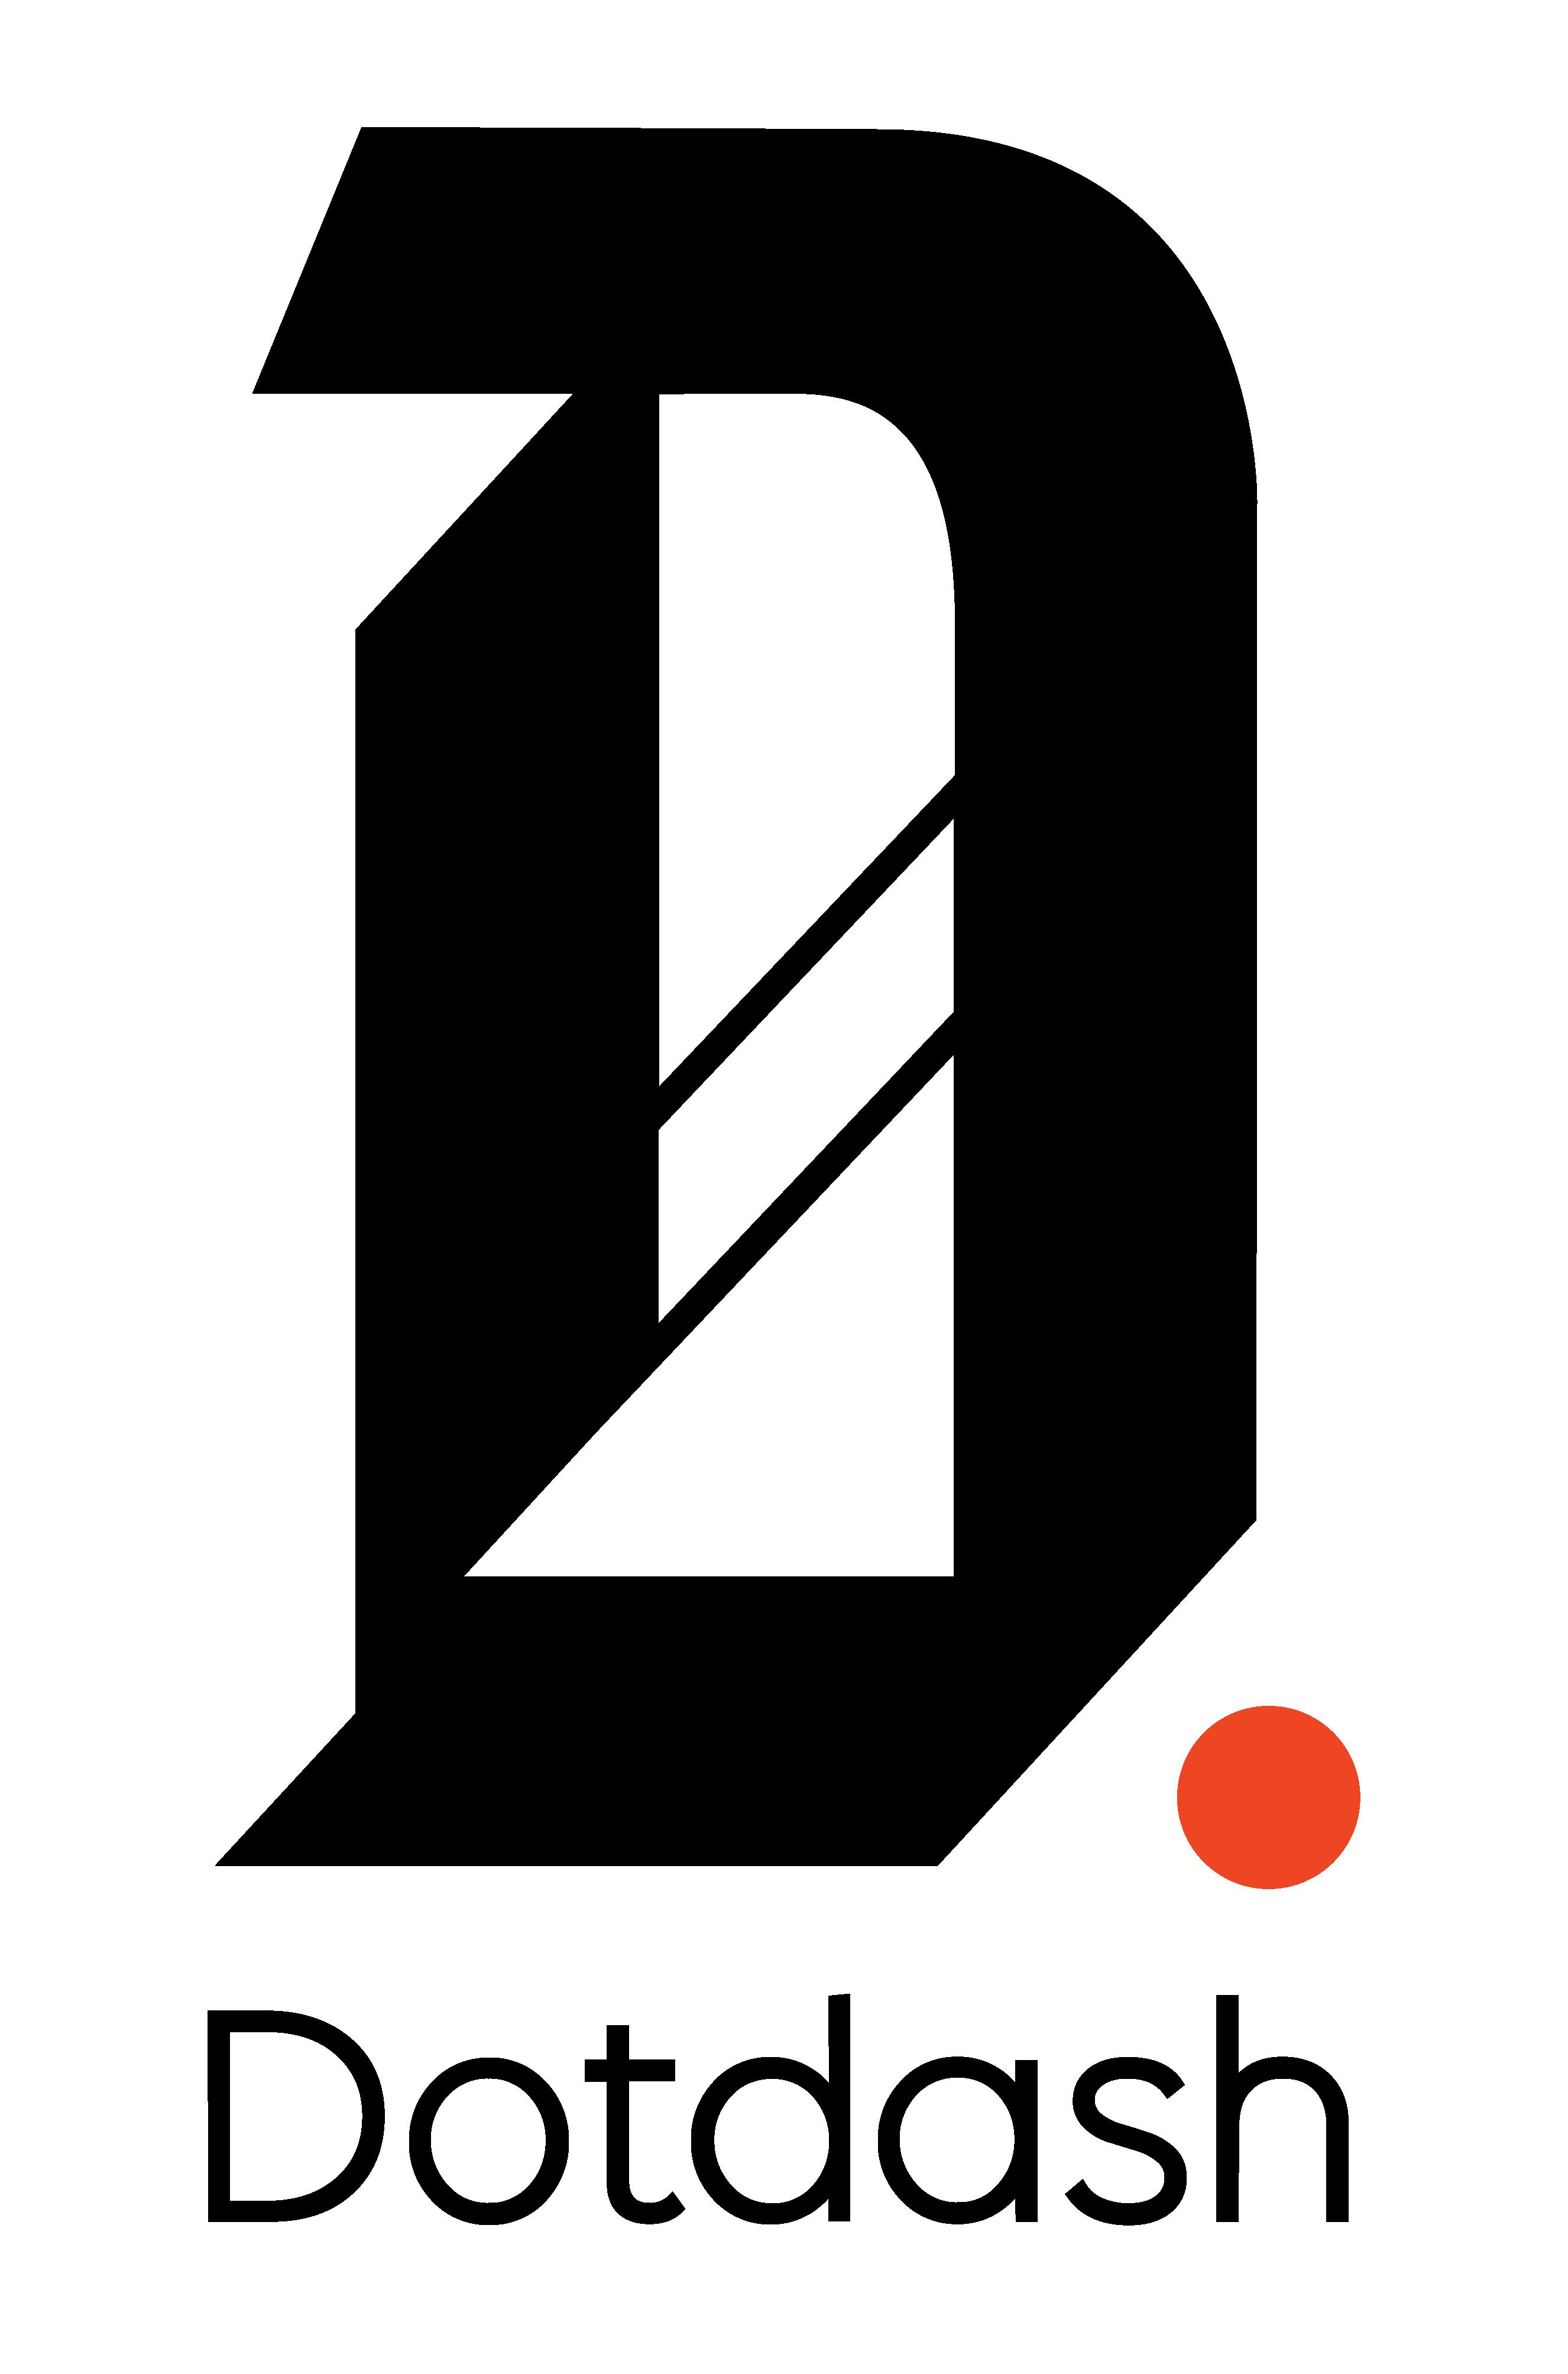 Dotdash - Wikipedia